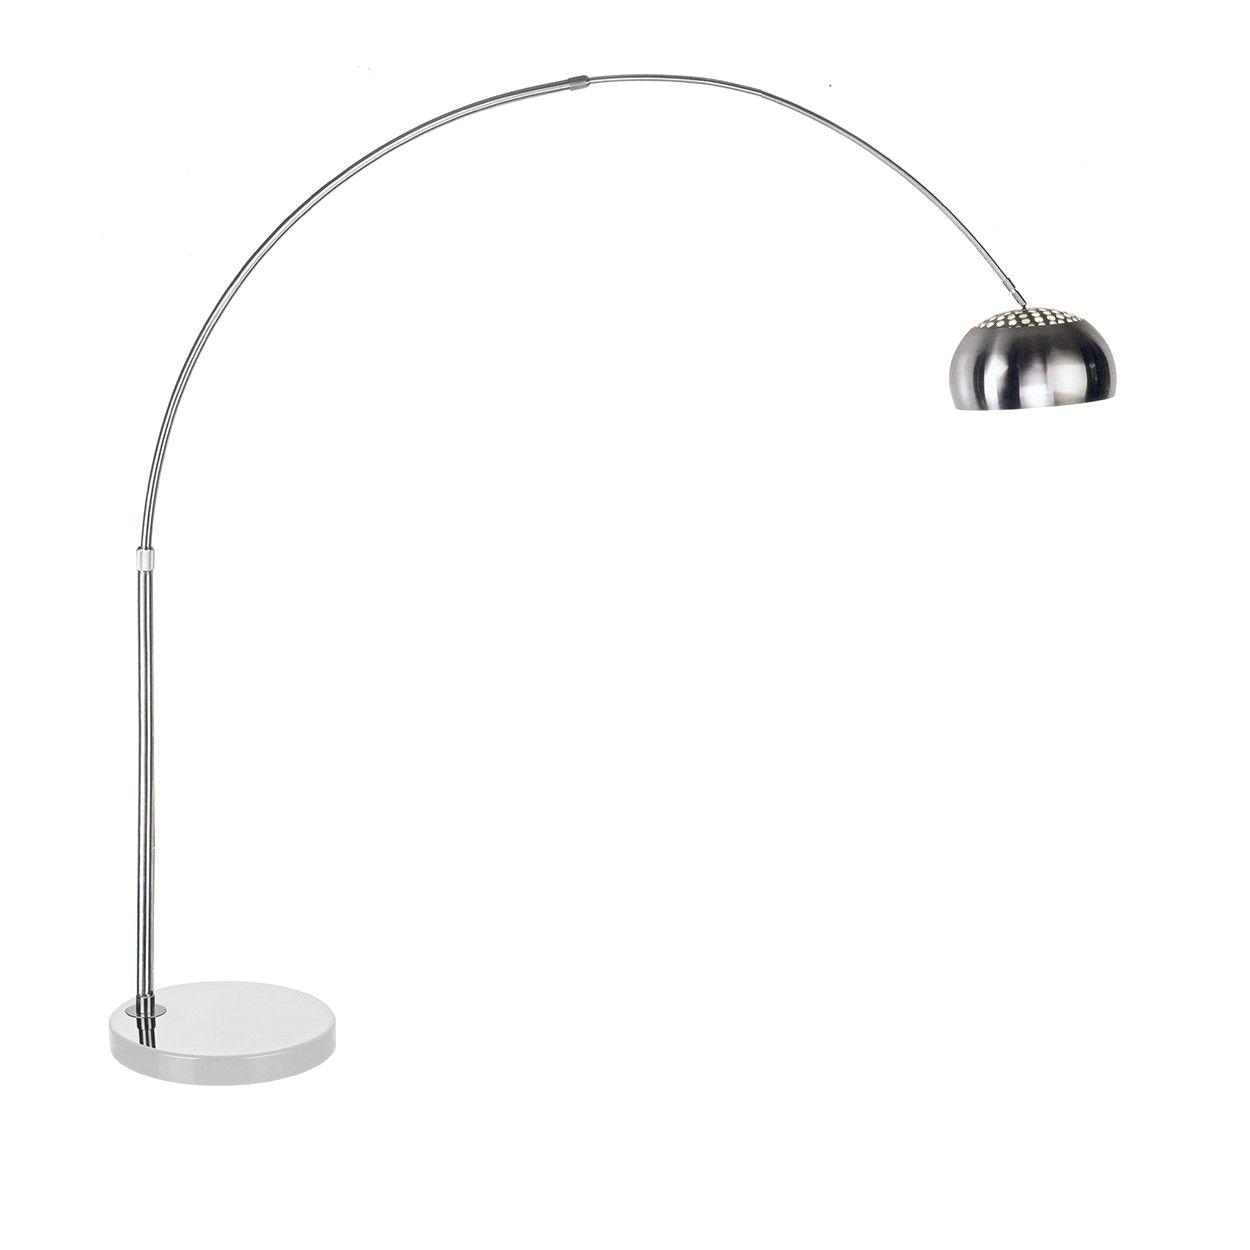 Replica Achille Castiglioni Arco Floor Lamp Mid Century Modern Reproduction Arco Floor Lamp Round White Marble